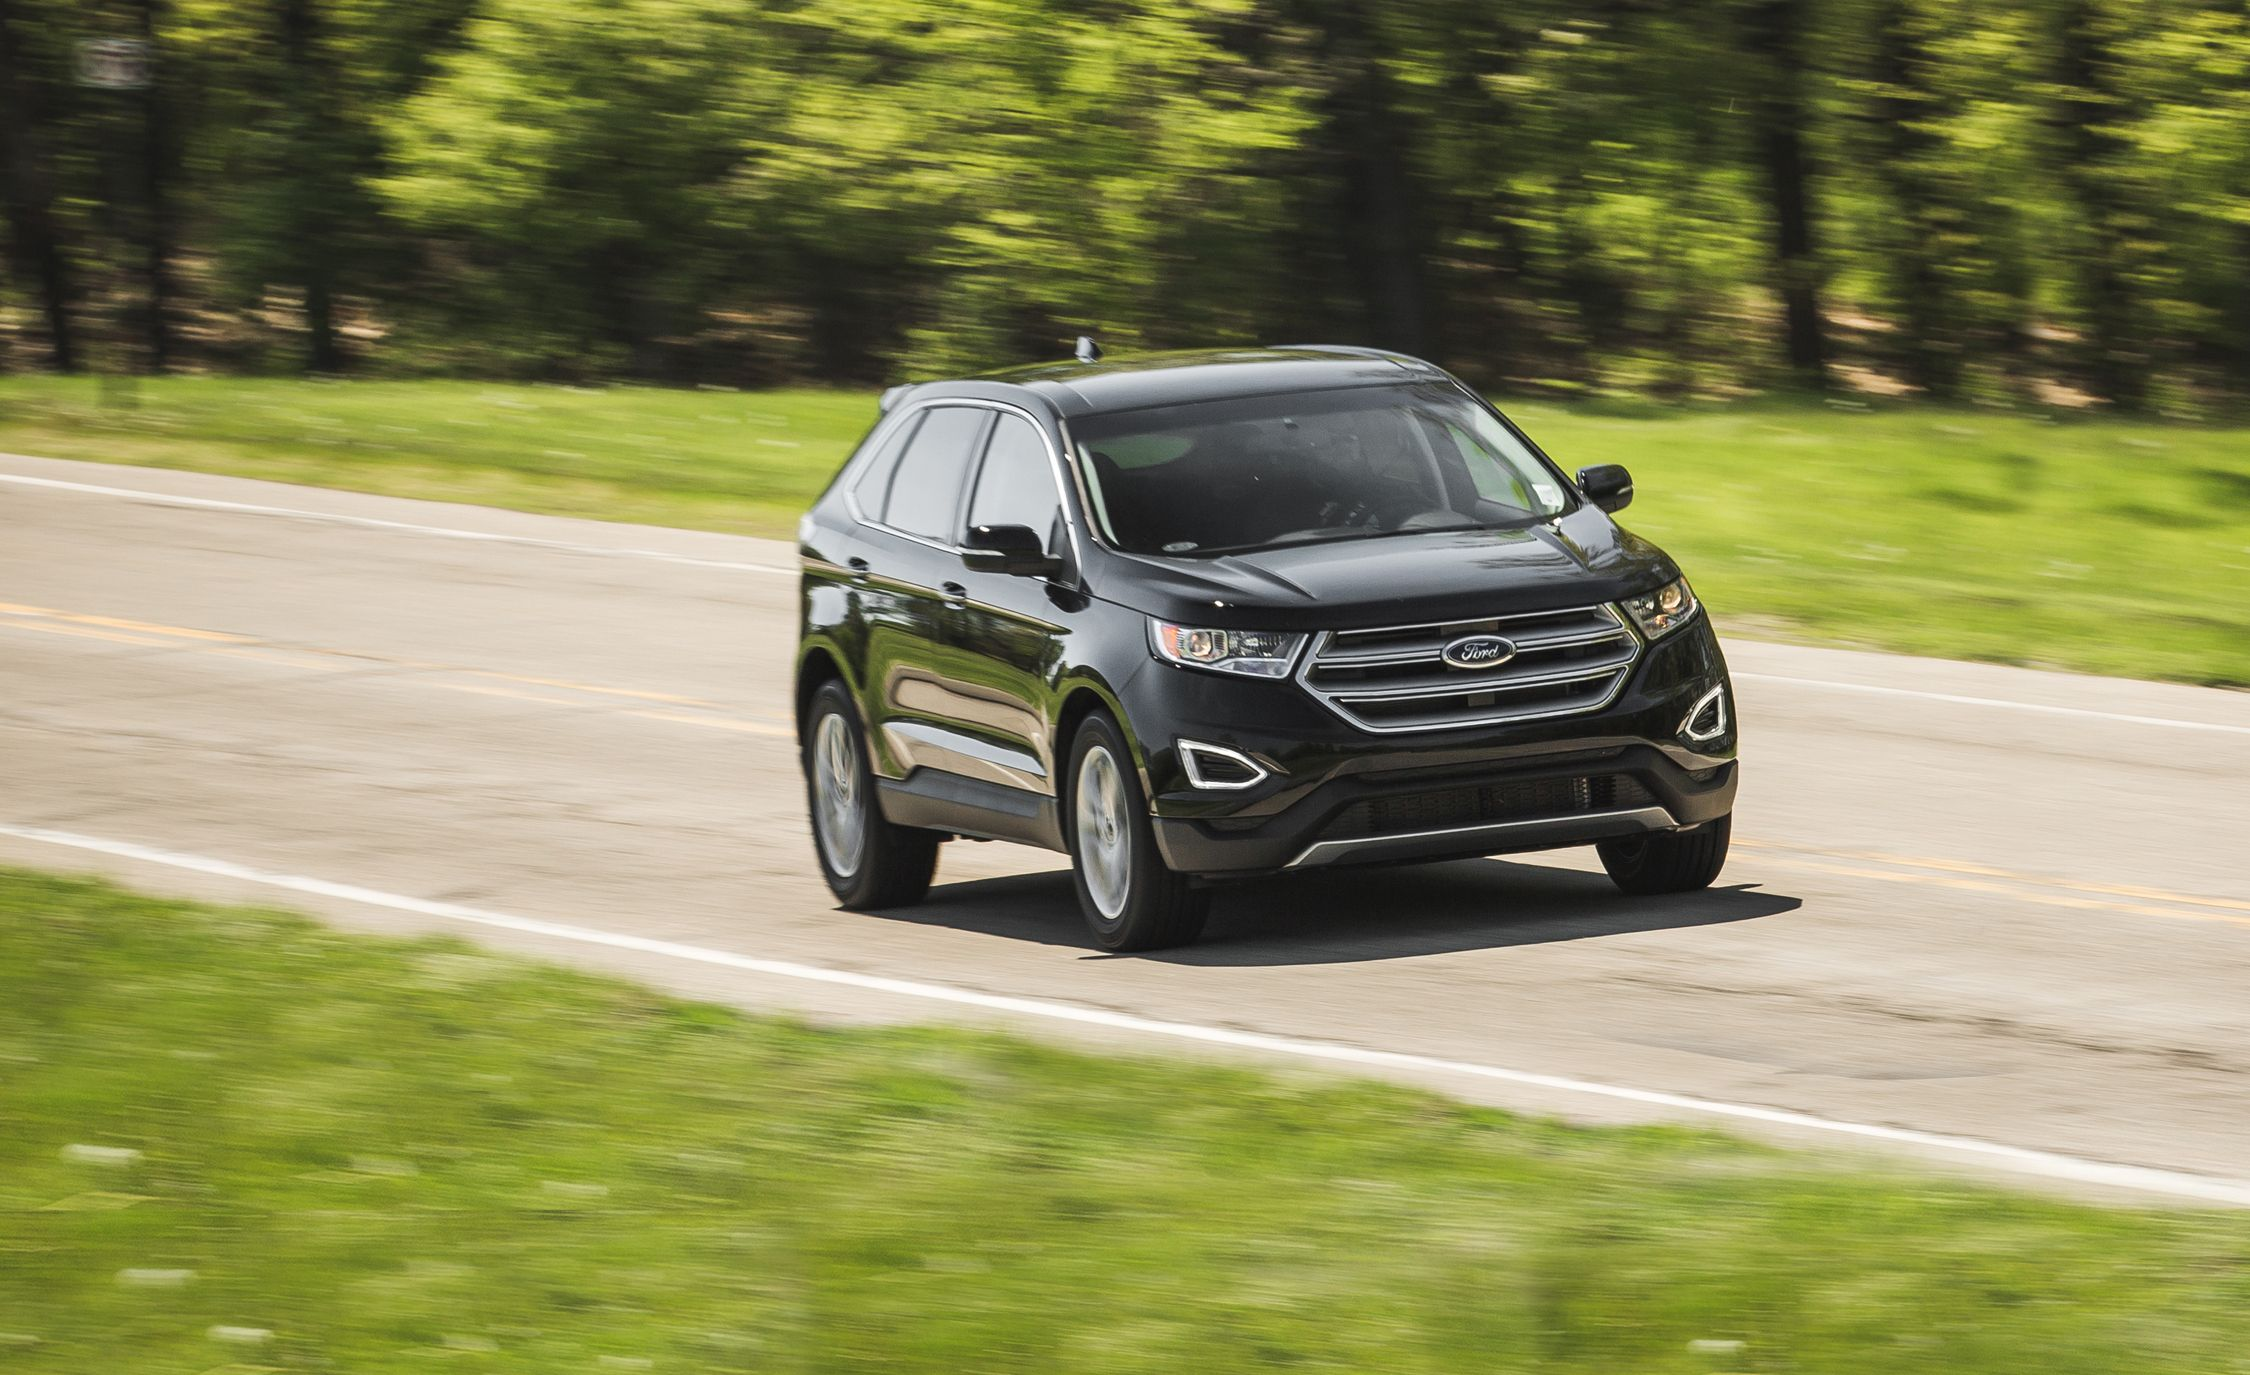 2017 Ford Edge 3.5L V-6 AWD